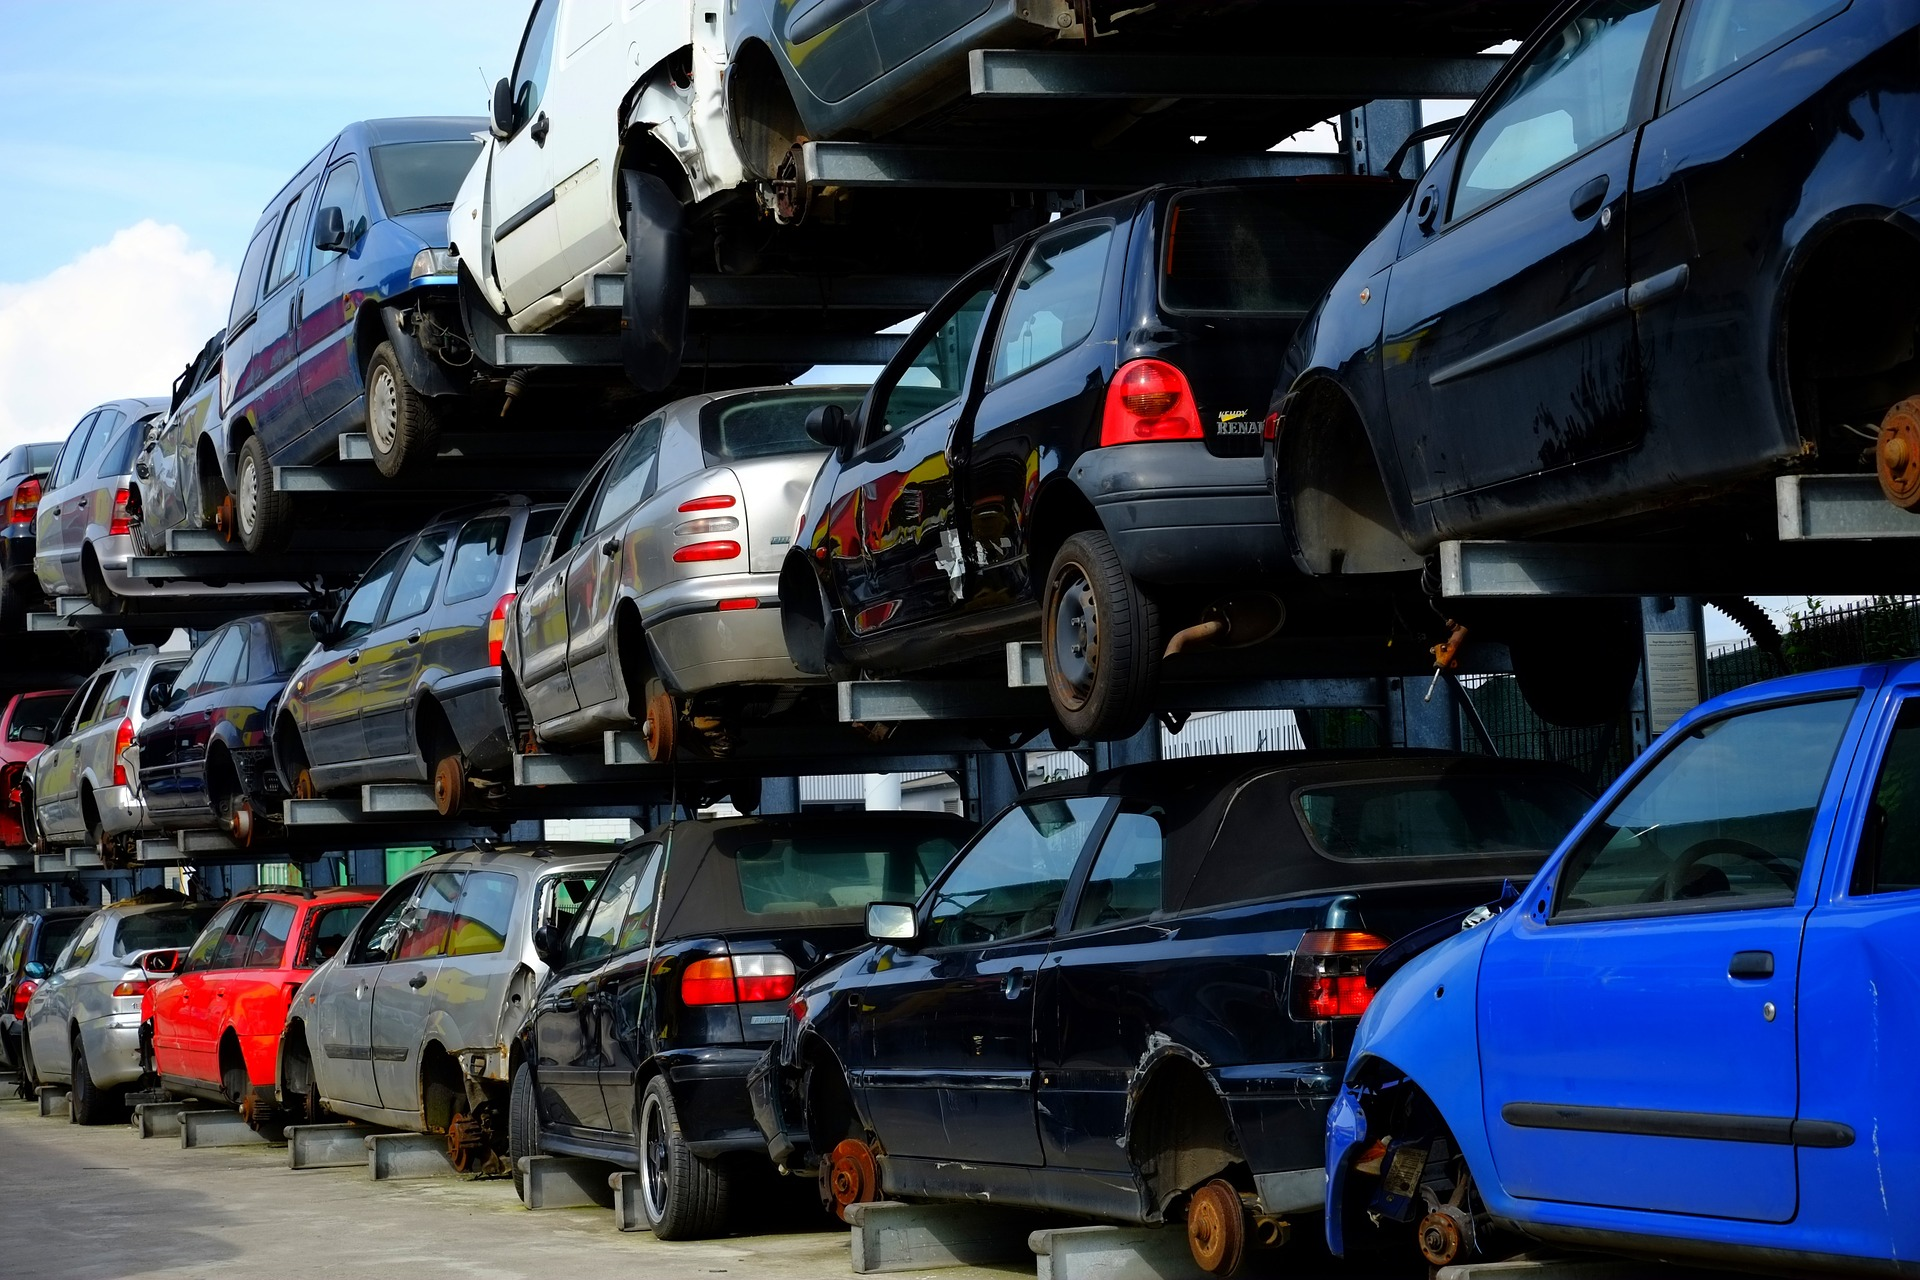 Scrap cars stacked in junkyard